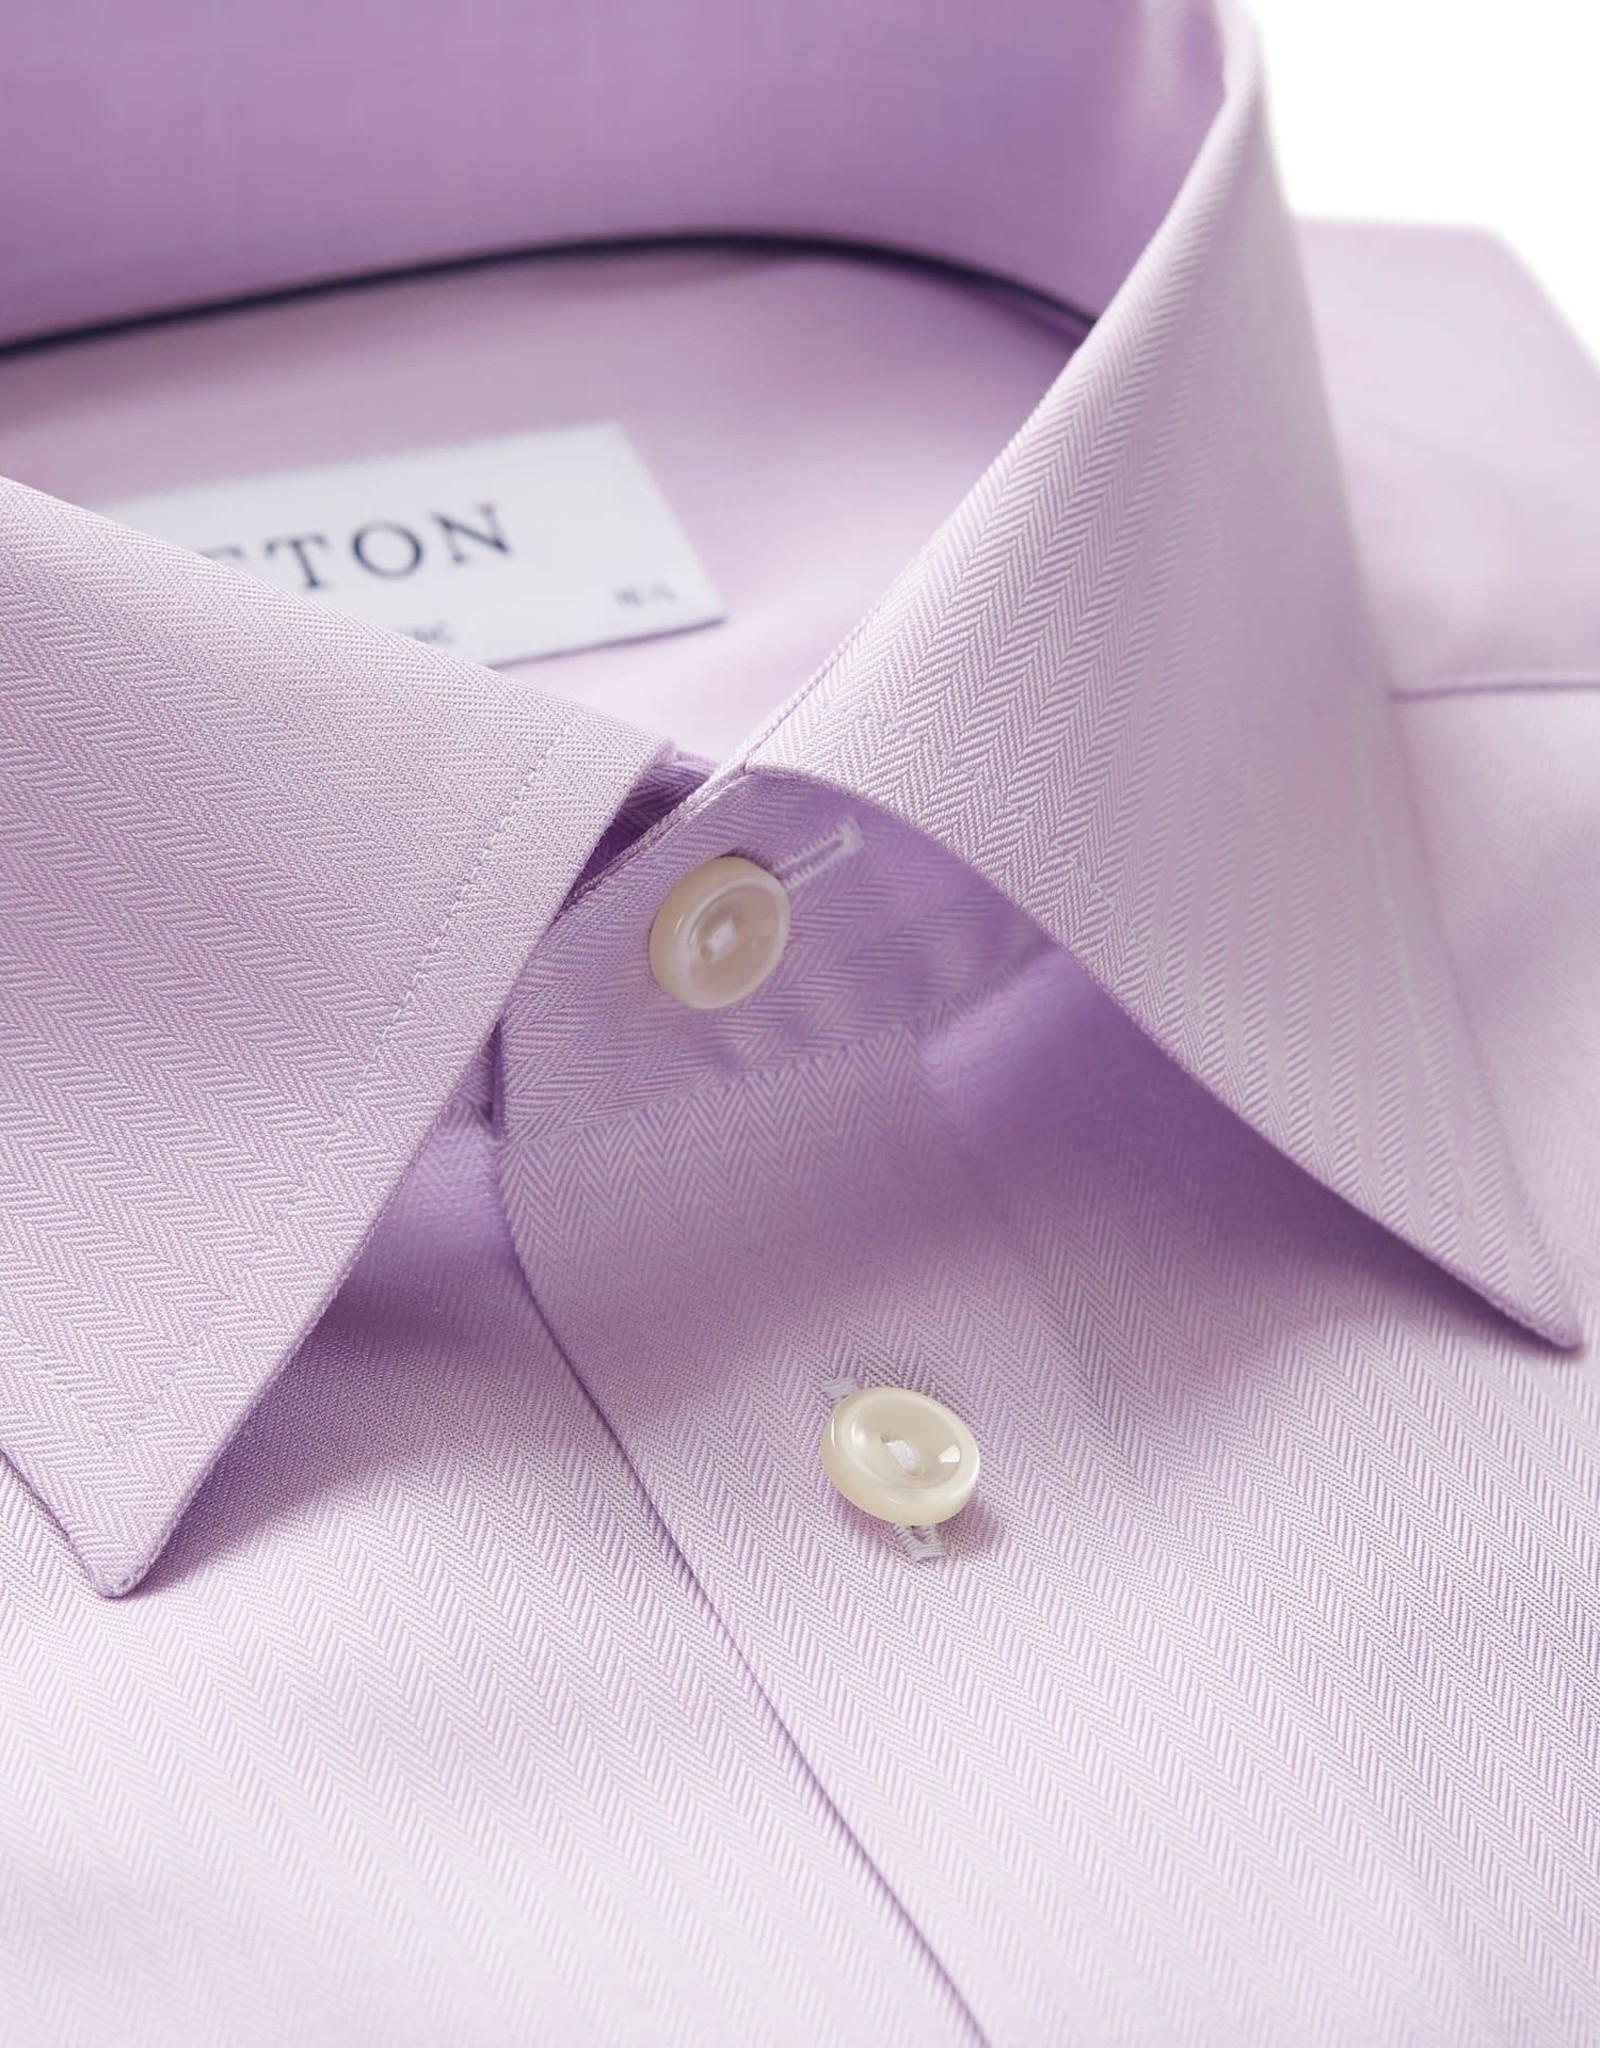 Eton Eton hemd lila classic 3153-78011/72